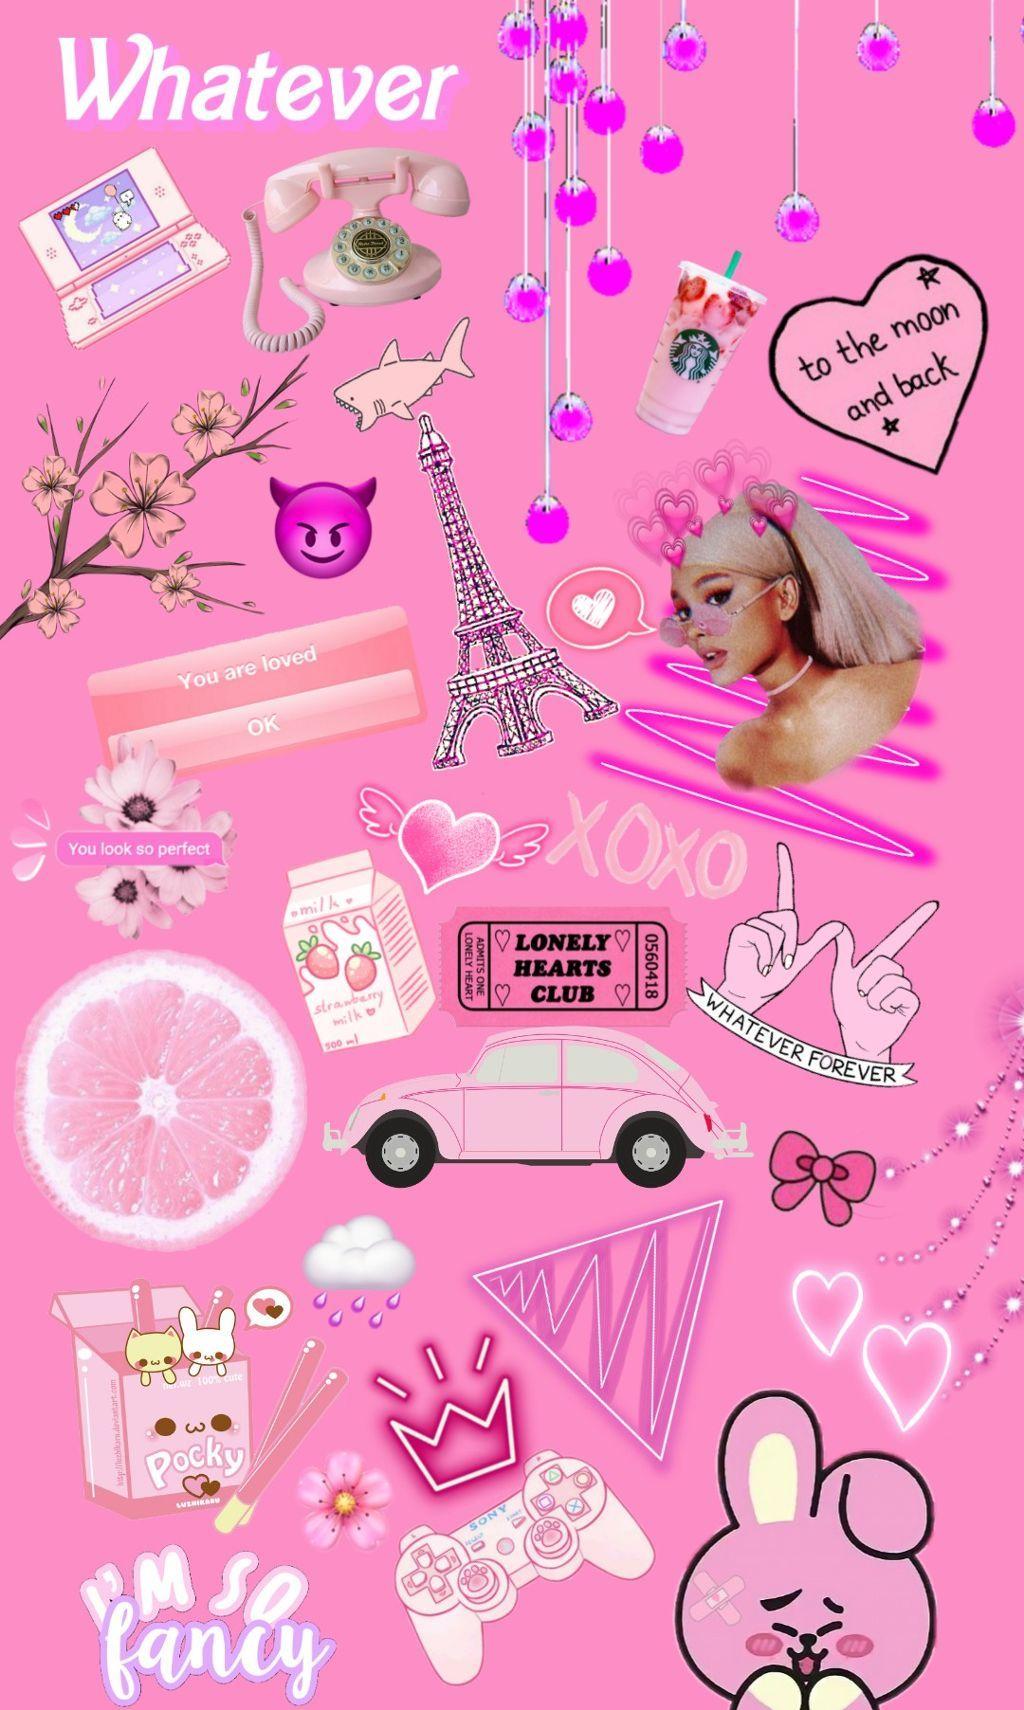 Freetoedit Tumblr Pink Background Wallpaper Girly Pink Wallpaper Backgrounds Pink Wallpaper Pink Aesthetic